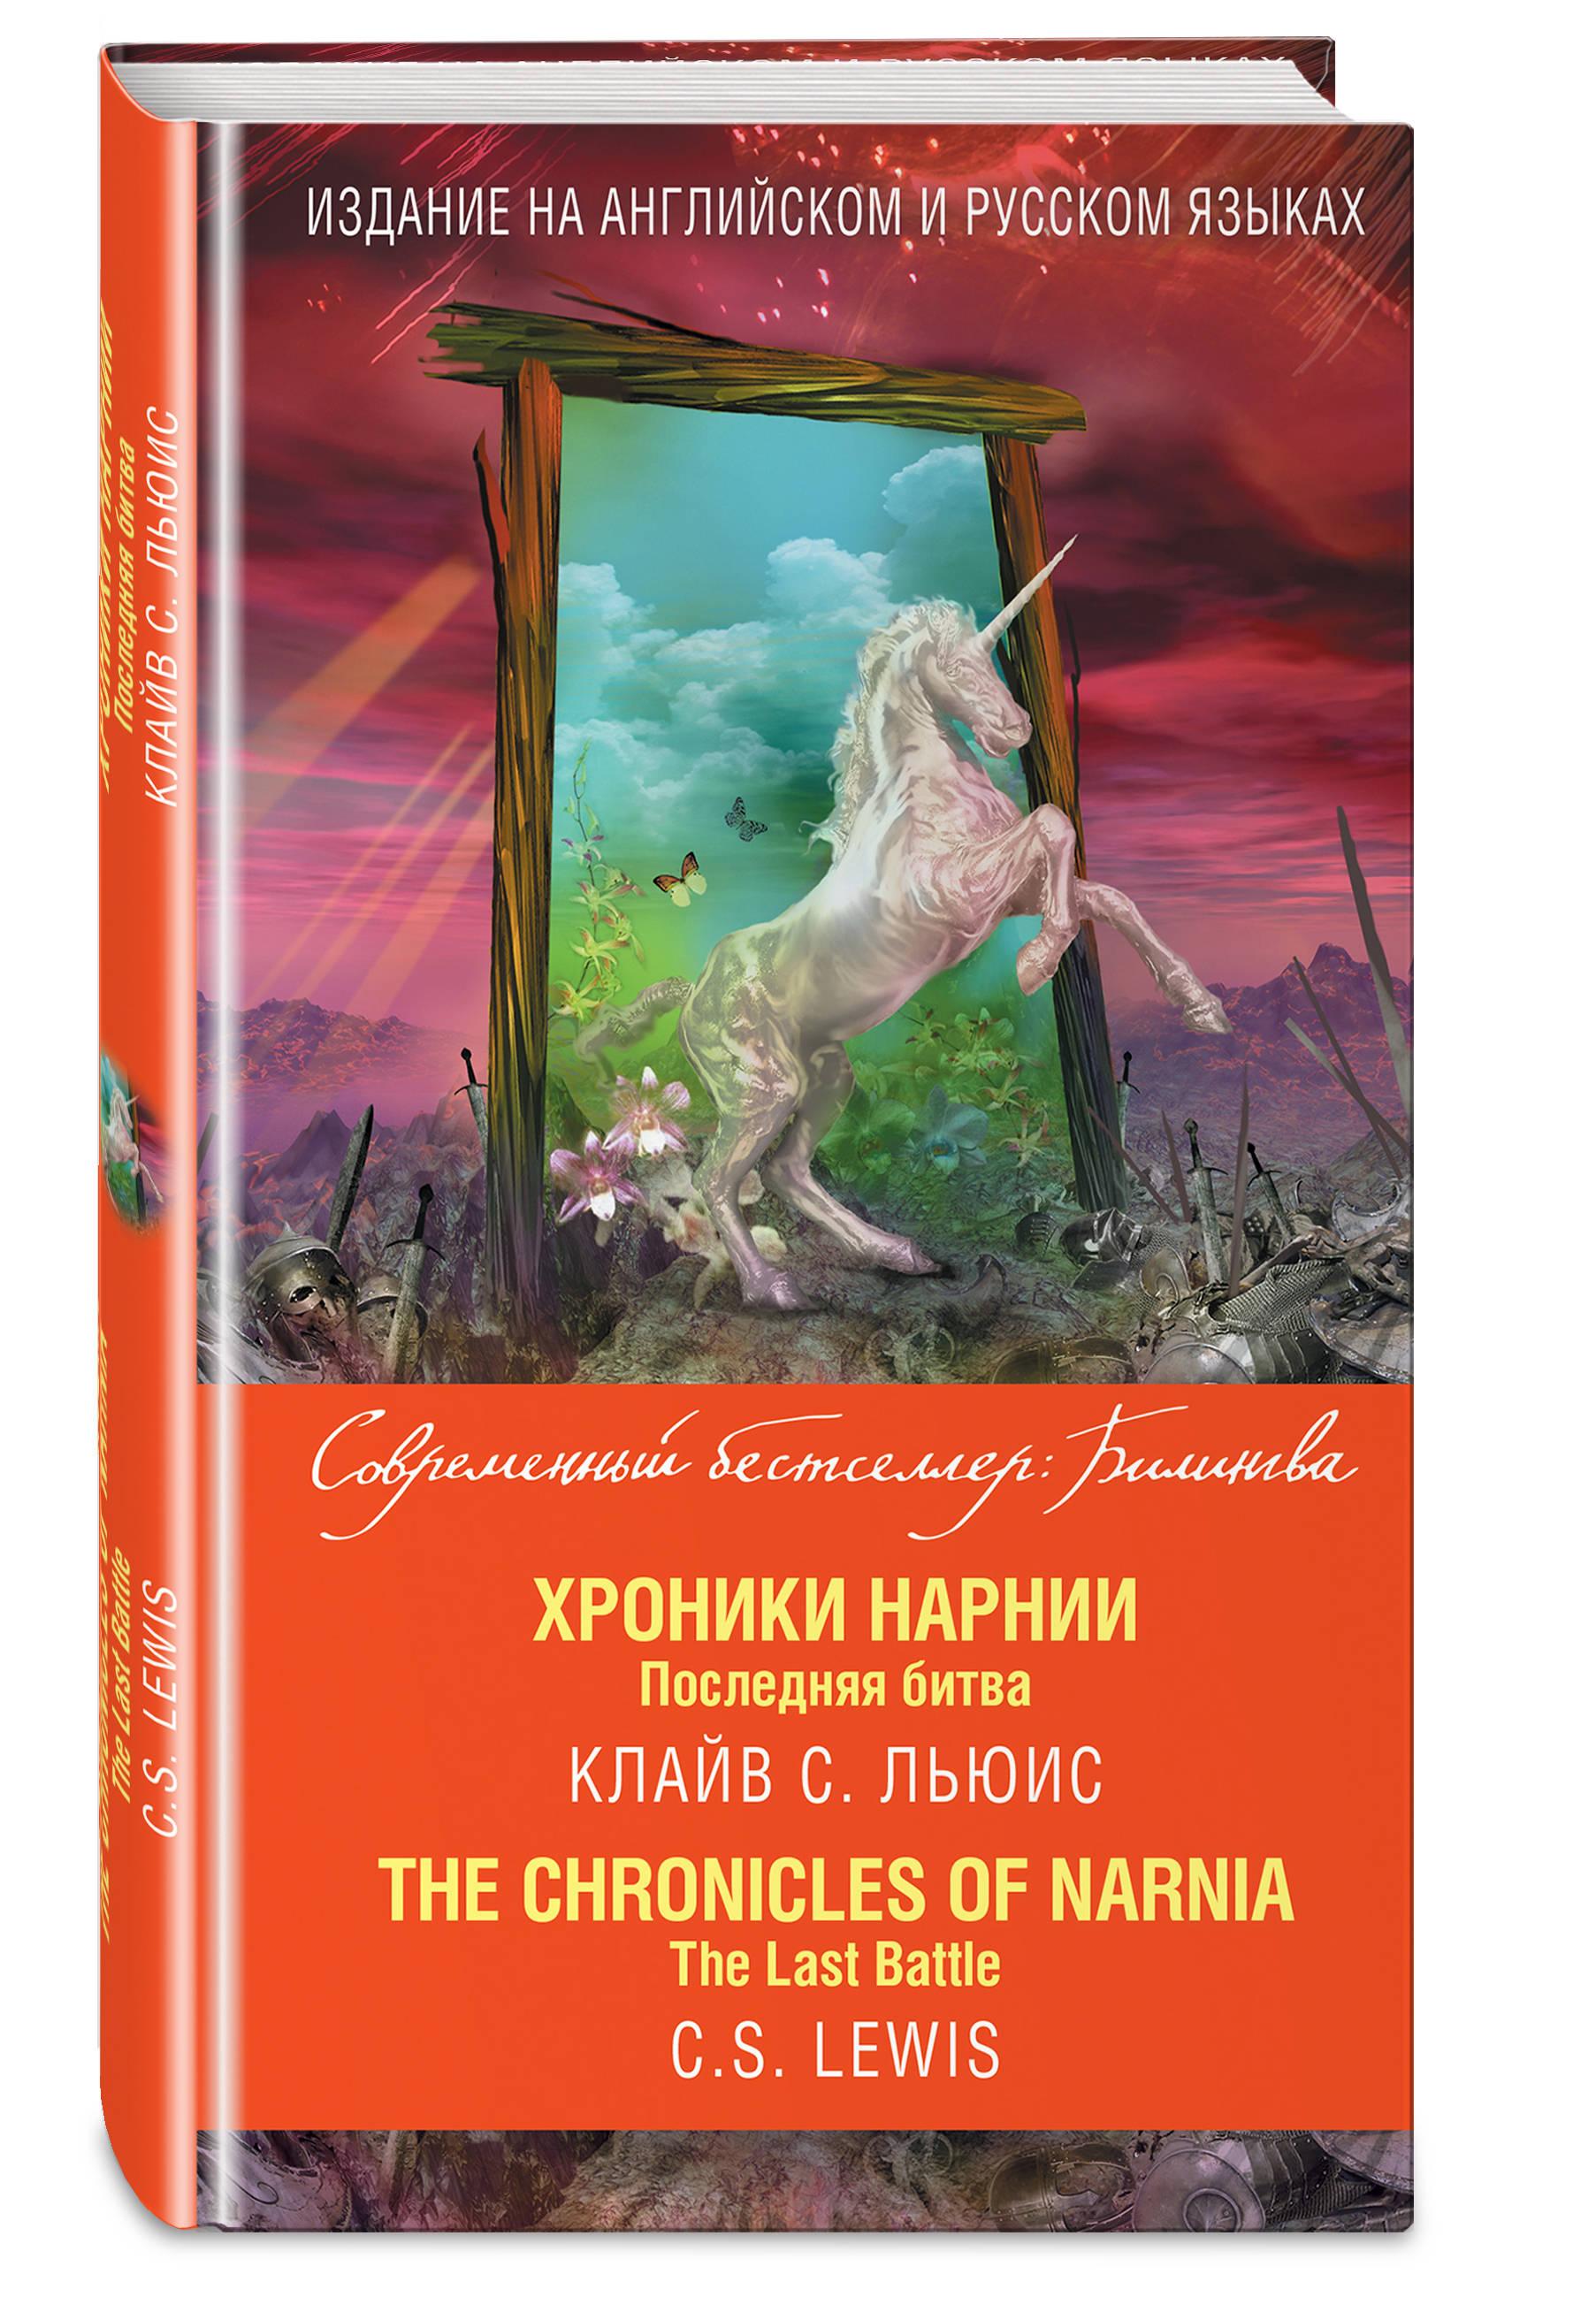 chronicles of narnia the the voyage of the dawn treader Льюис К. Хроники Нарнии. Последняя битва = The Chronicles of Narnia. The Last Battle